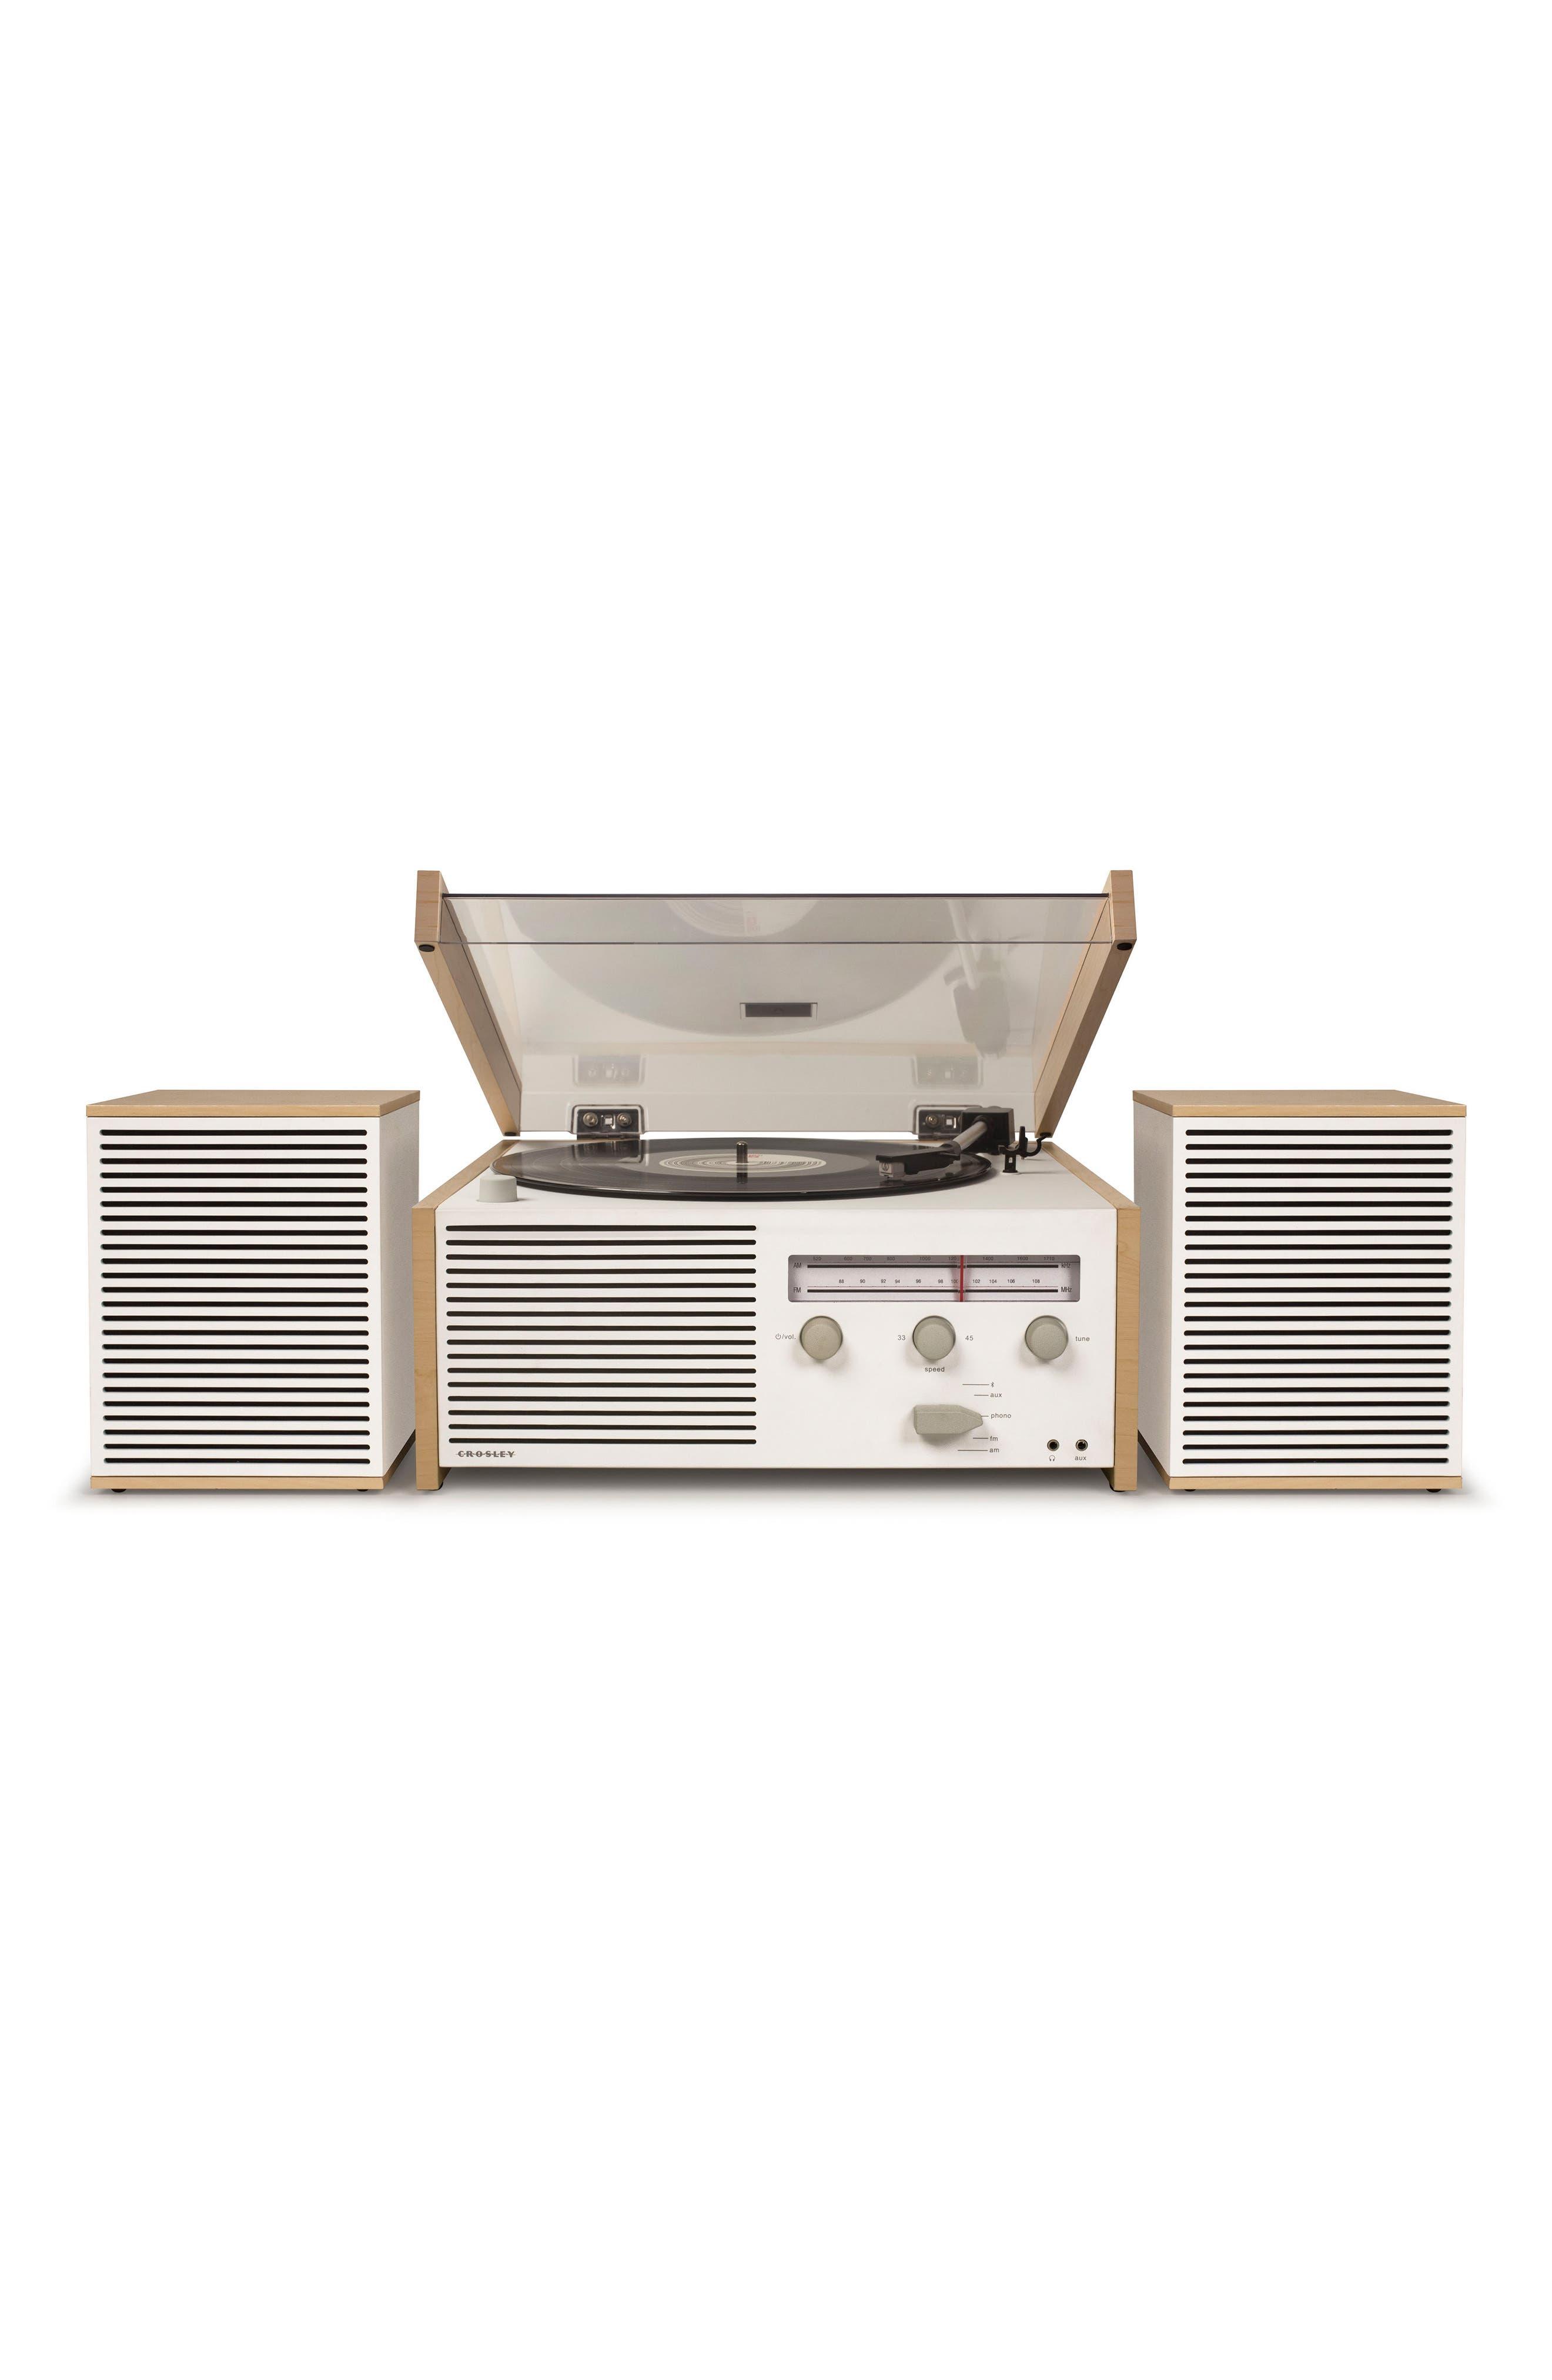 Main Image - Crosley Radio Switch II Turntable & Speakers Entertainment System